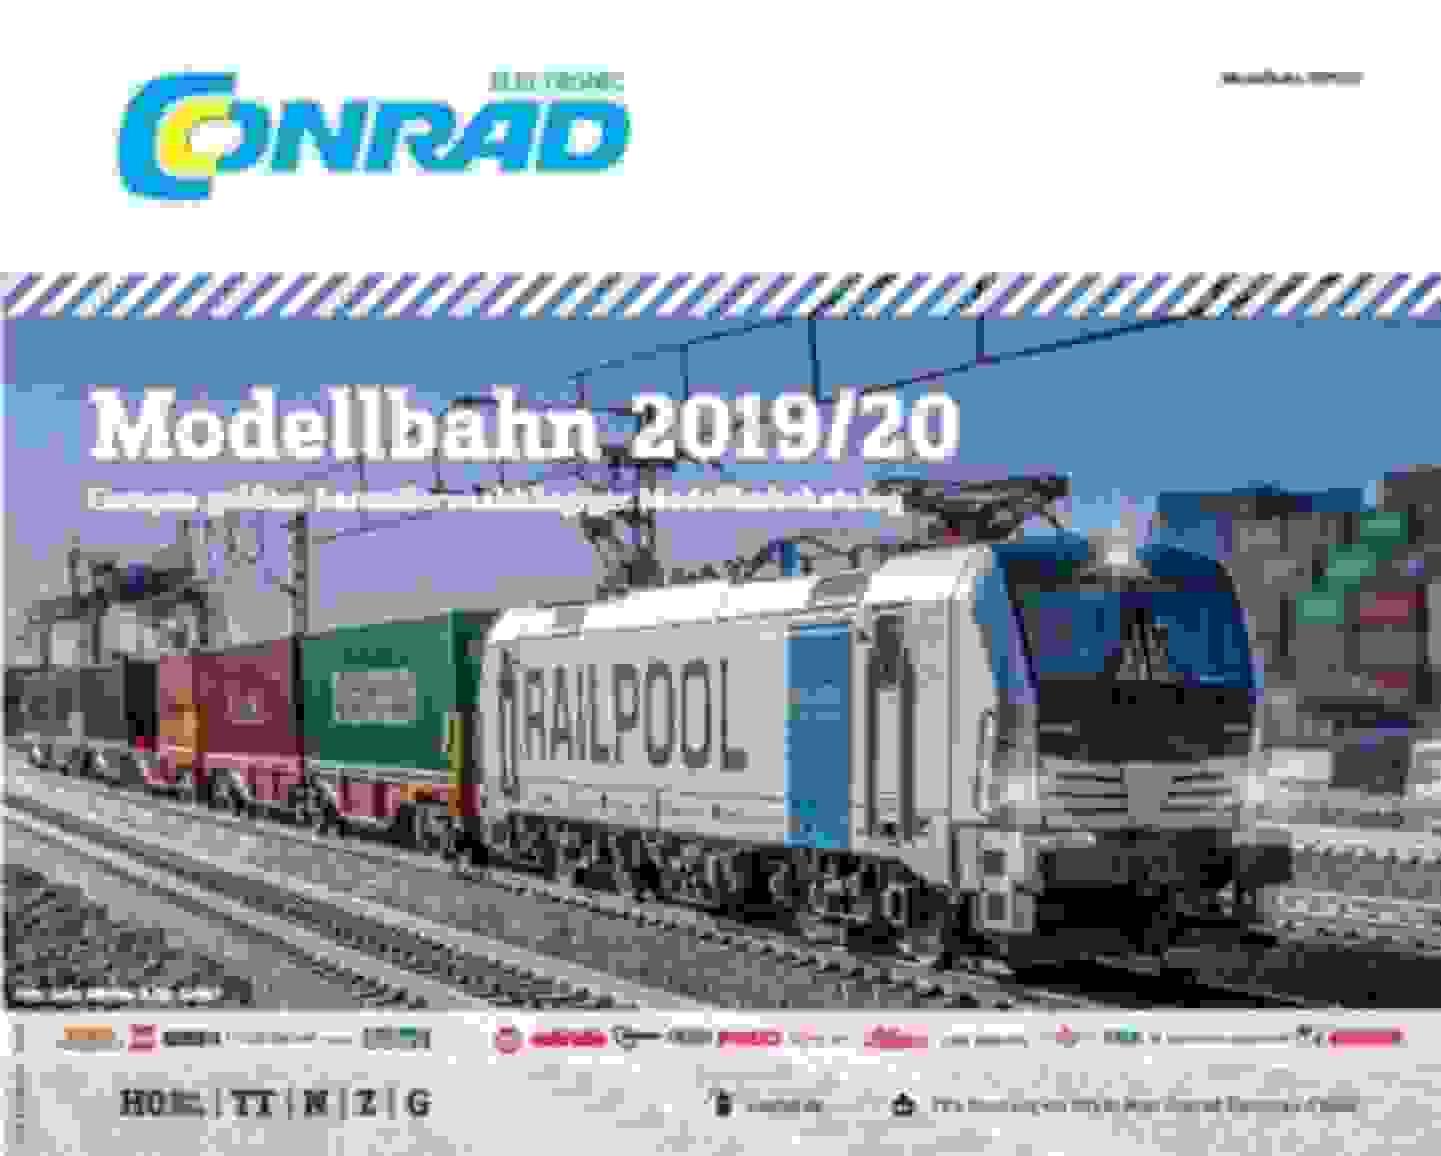 Modellbahnkatalog 2019-20